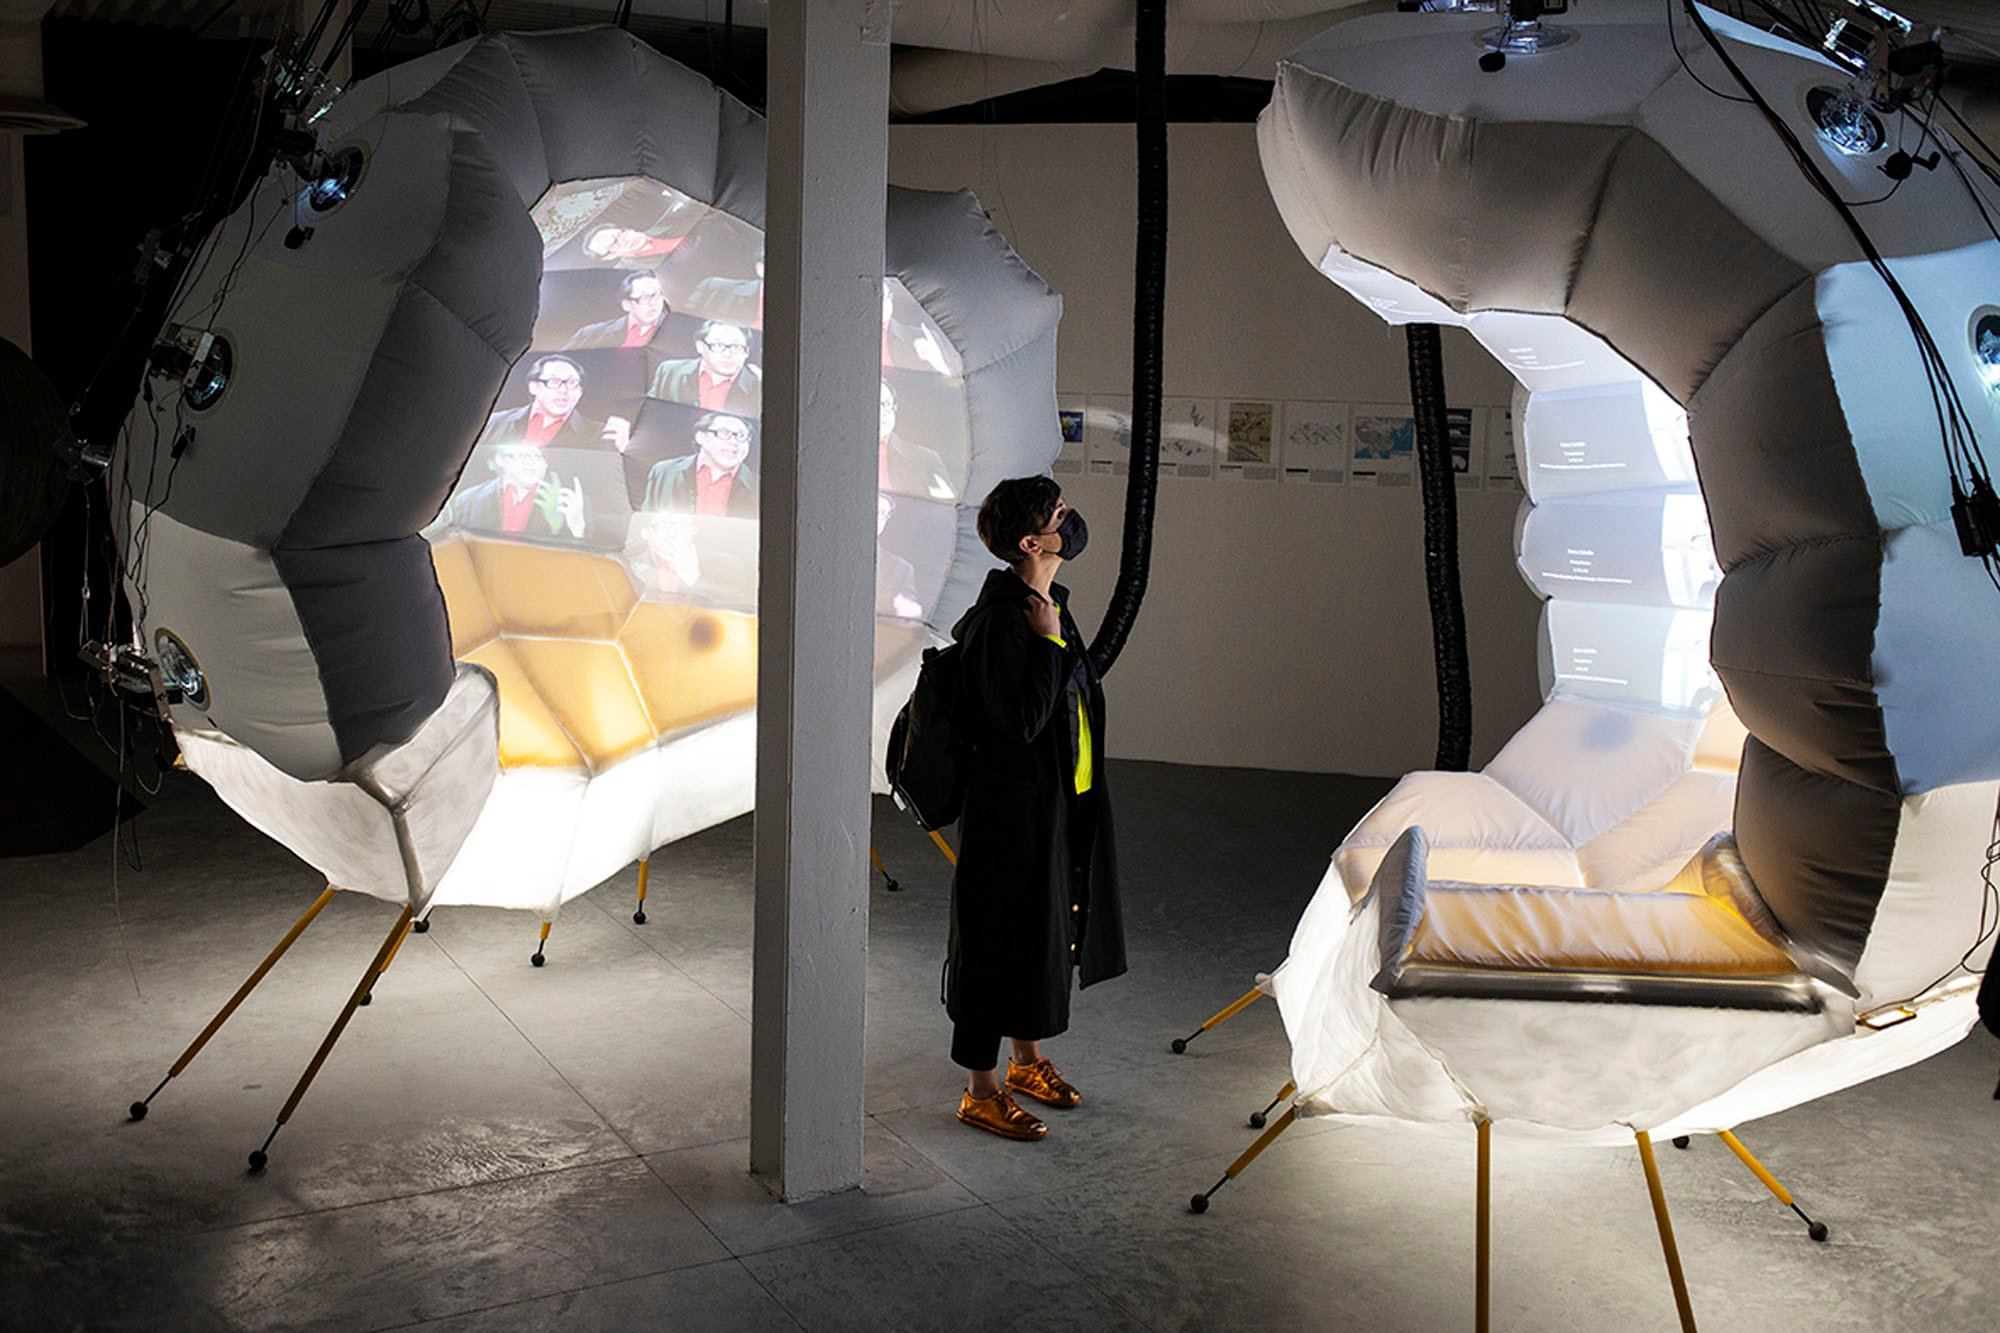 Daniel López-Pérez; Reiser + Umemoto; Princeton University School of Architecture /Geoscope 2: Worlds, 2021 /Foto:Francesco Galli/Courtesy: La Biennale di Venezia